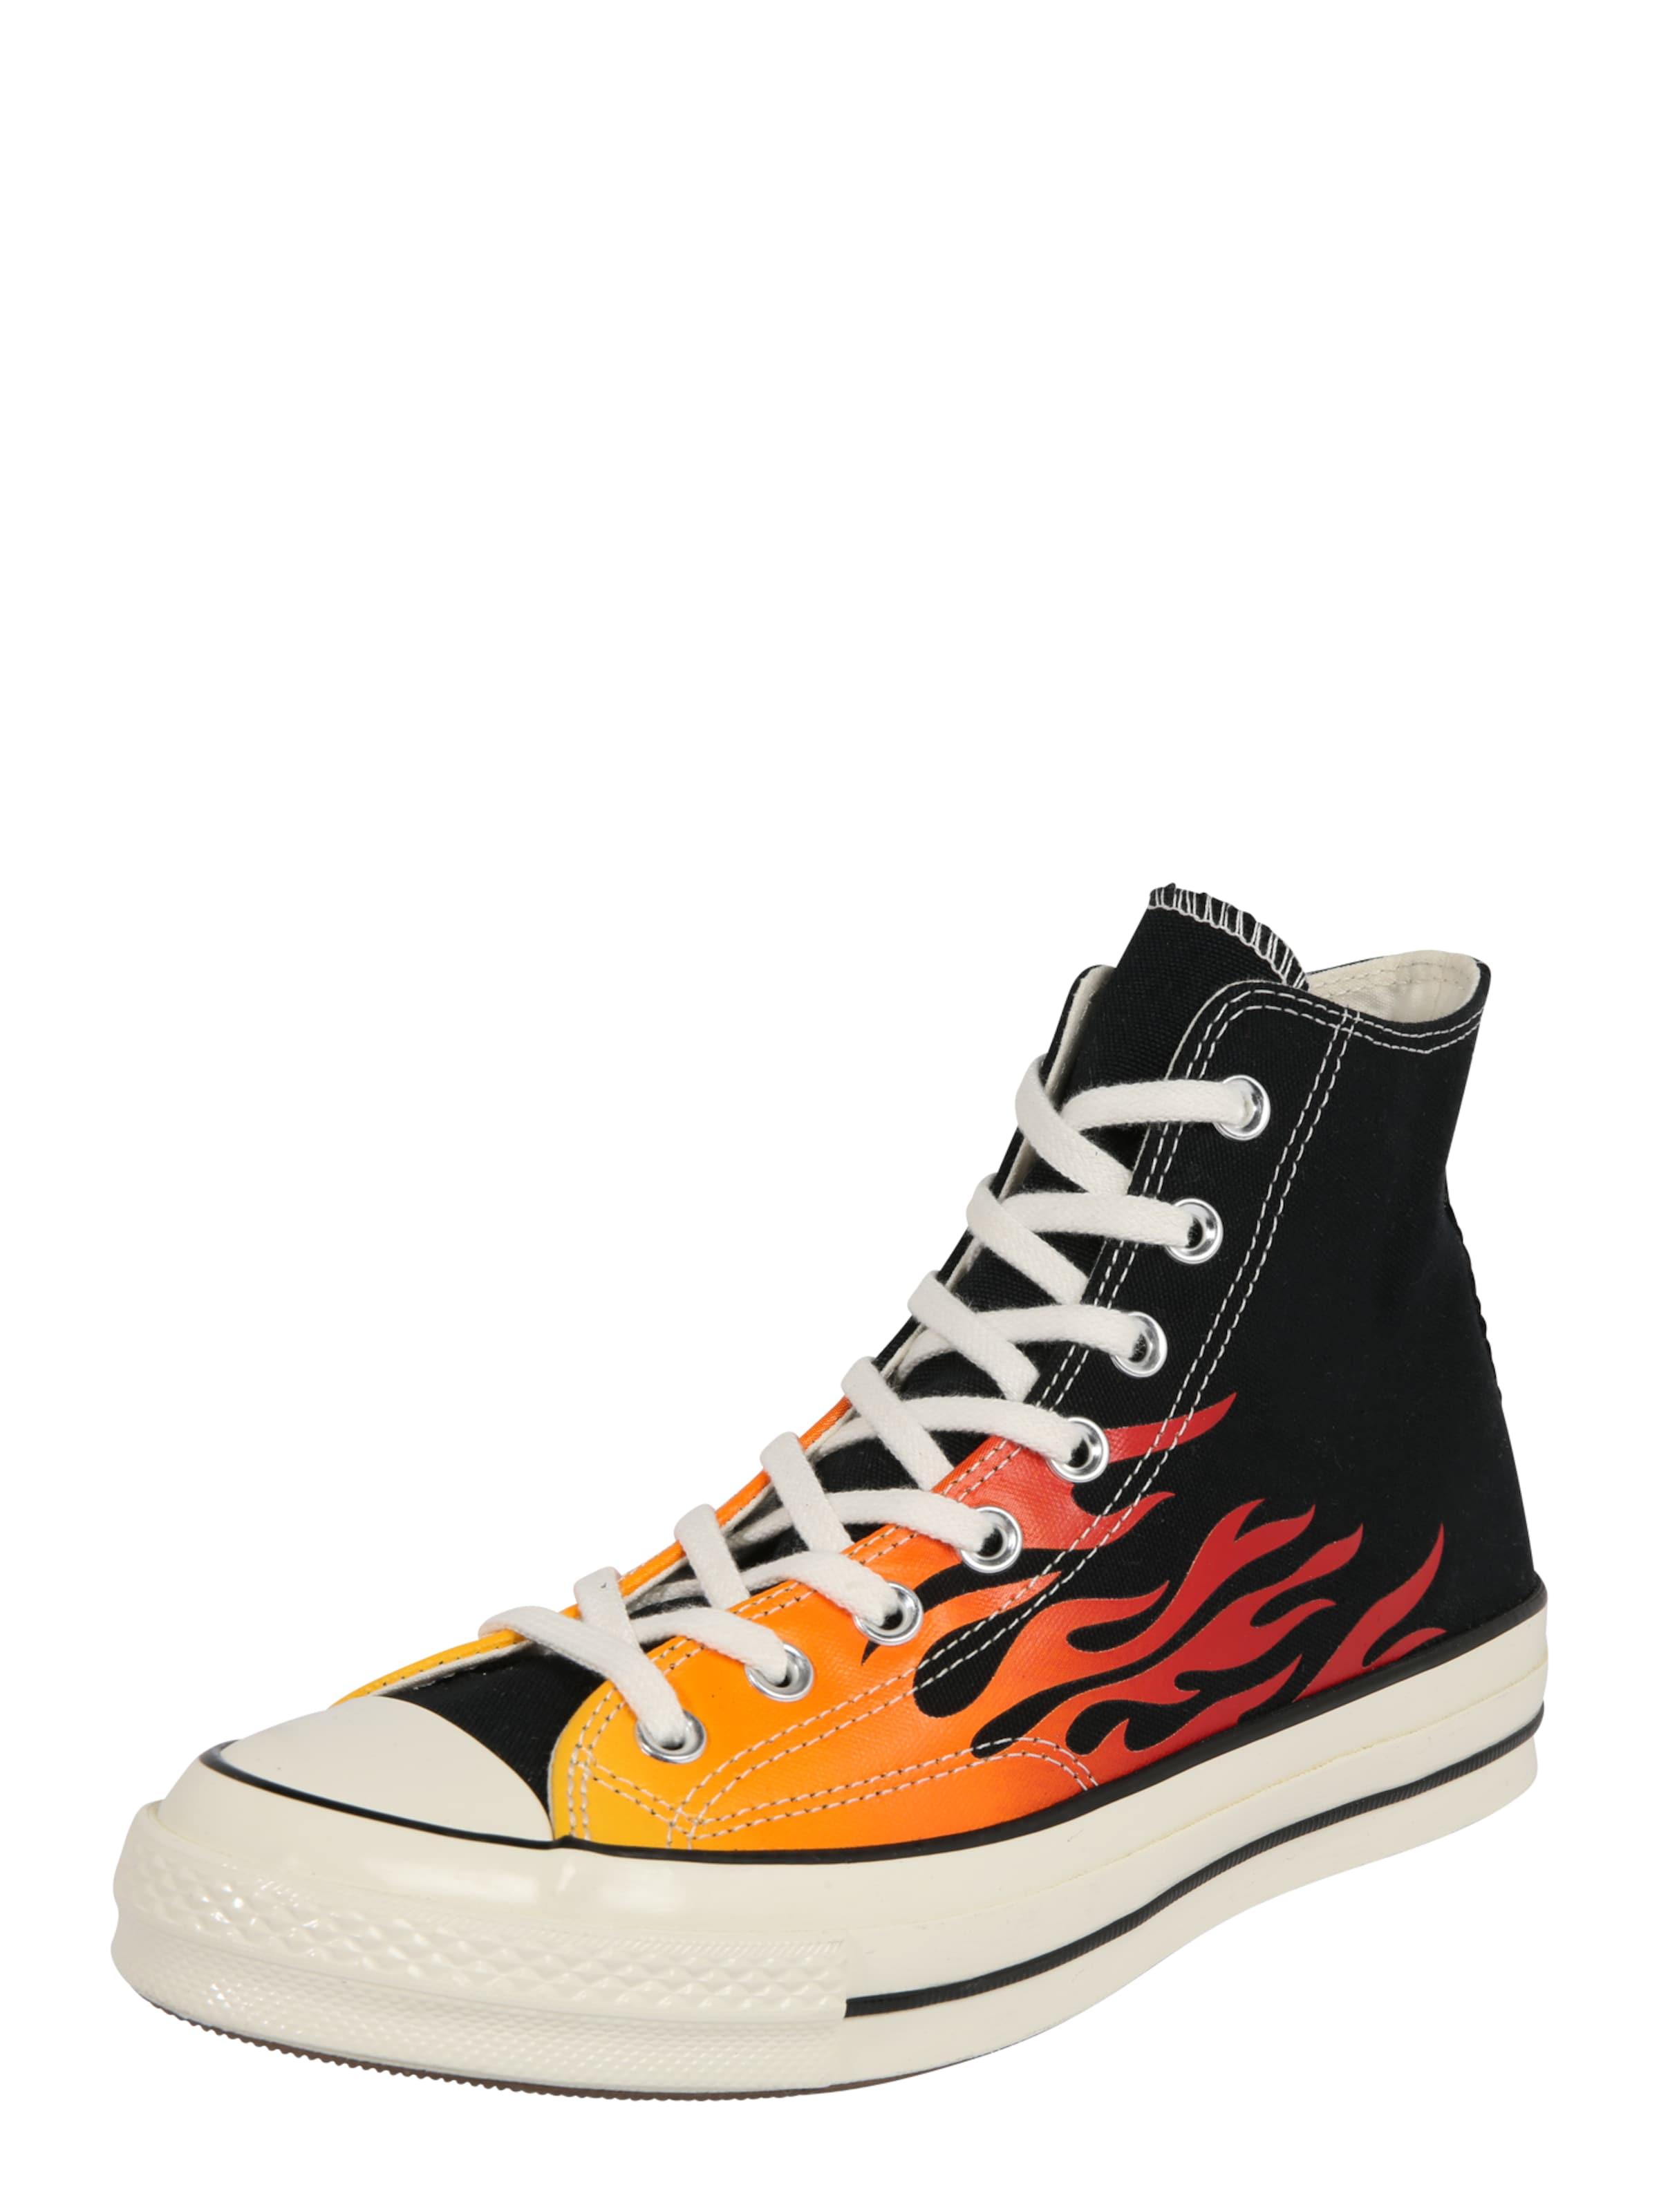 RemixedHi' Converse 70 In Sneaker 'chuck Prints RotSchwarz Archive KJlFc1